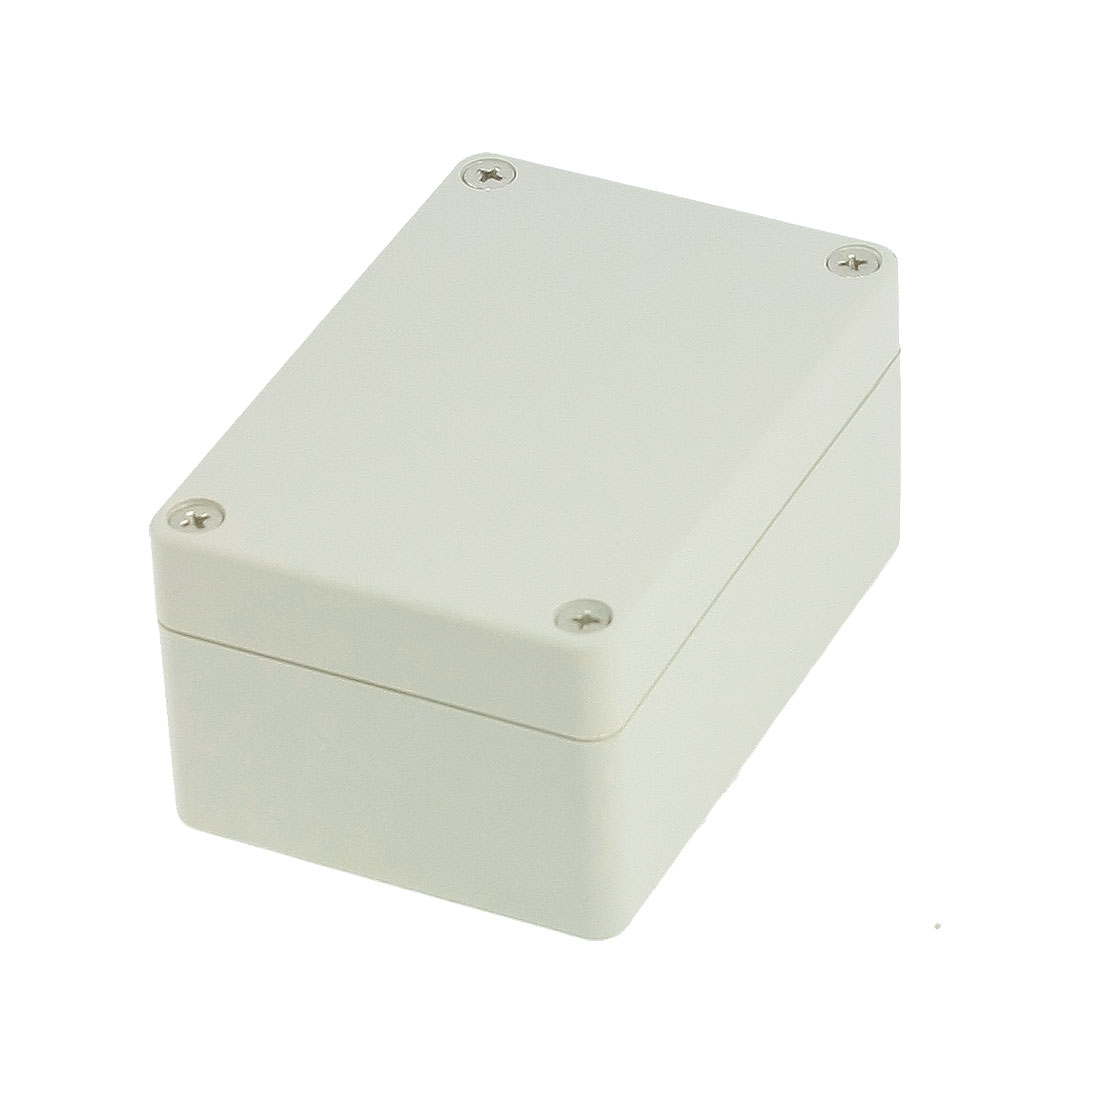 100mm x 68mm x 50mm Waterproof Plastic Enclouse Case DIY Junction Box